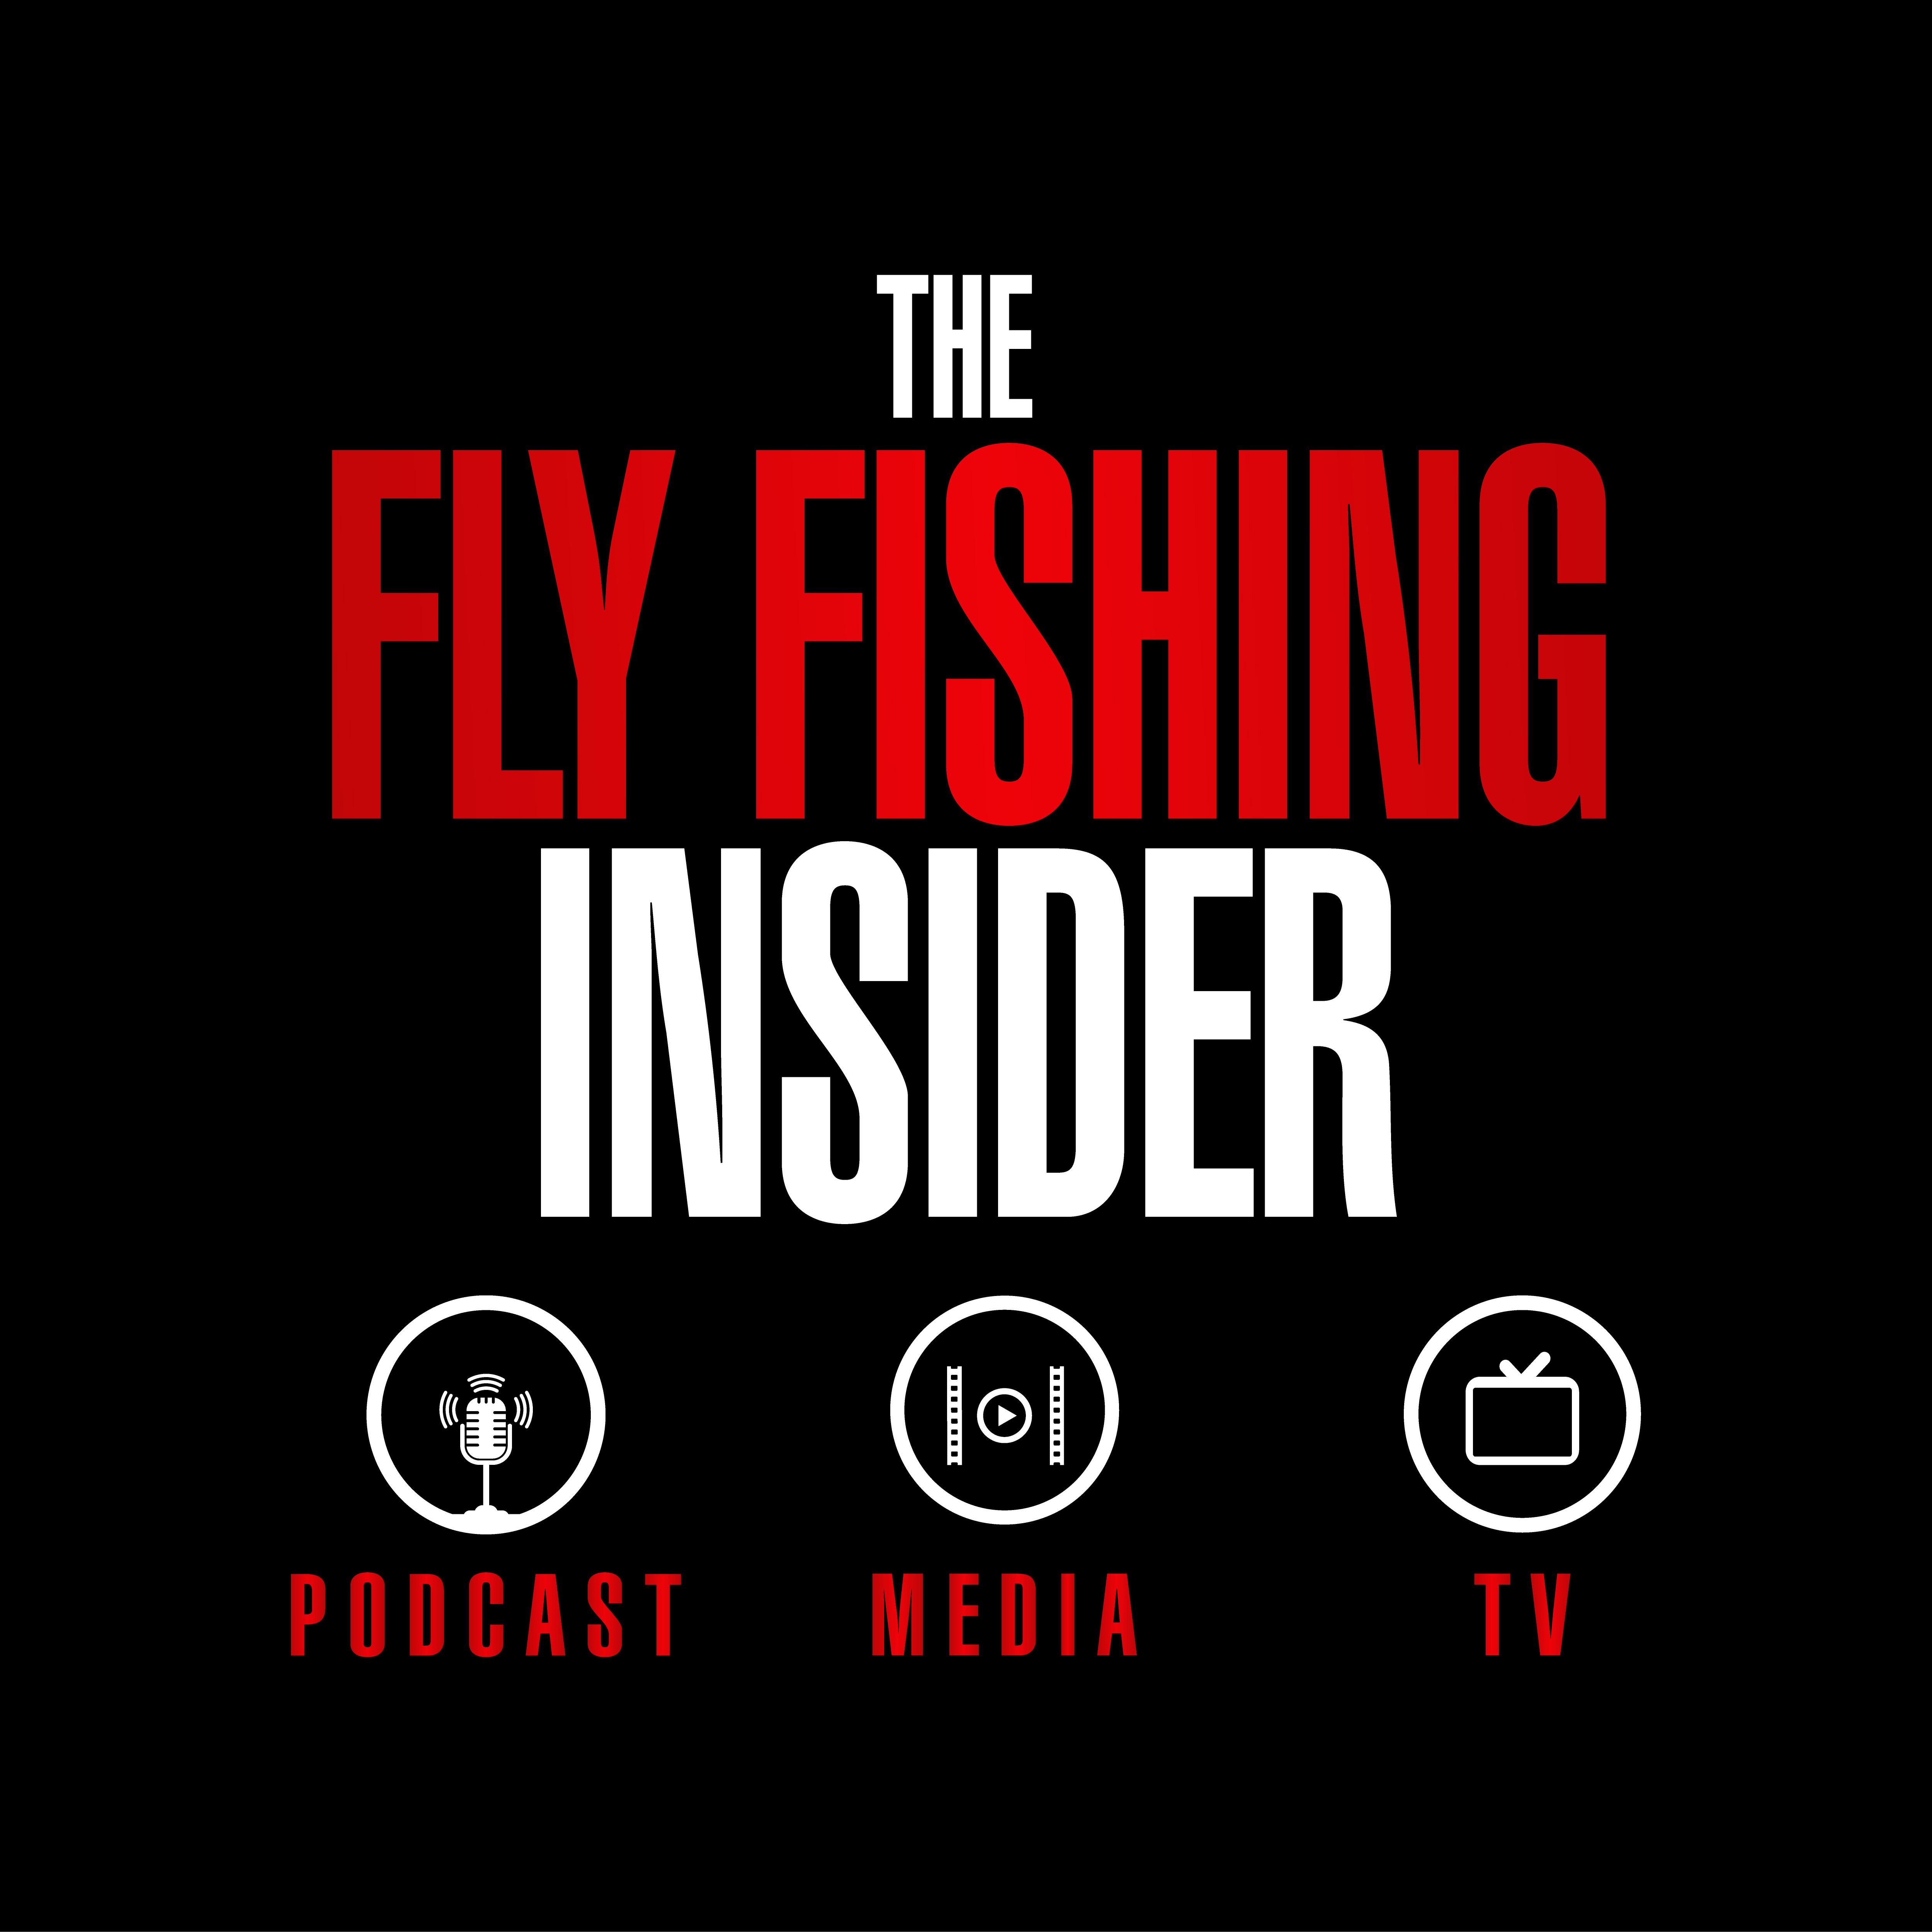 Fly Fishing Insider Podcast show art